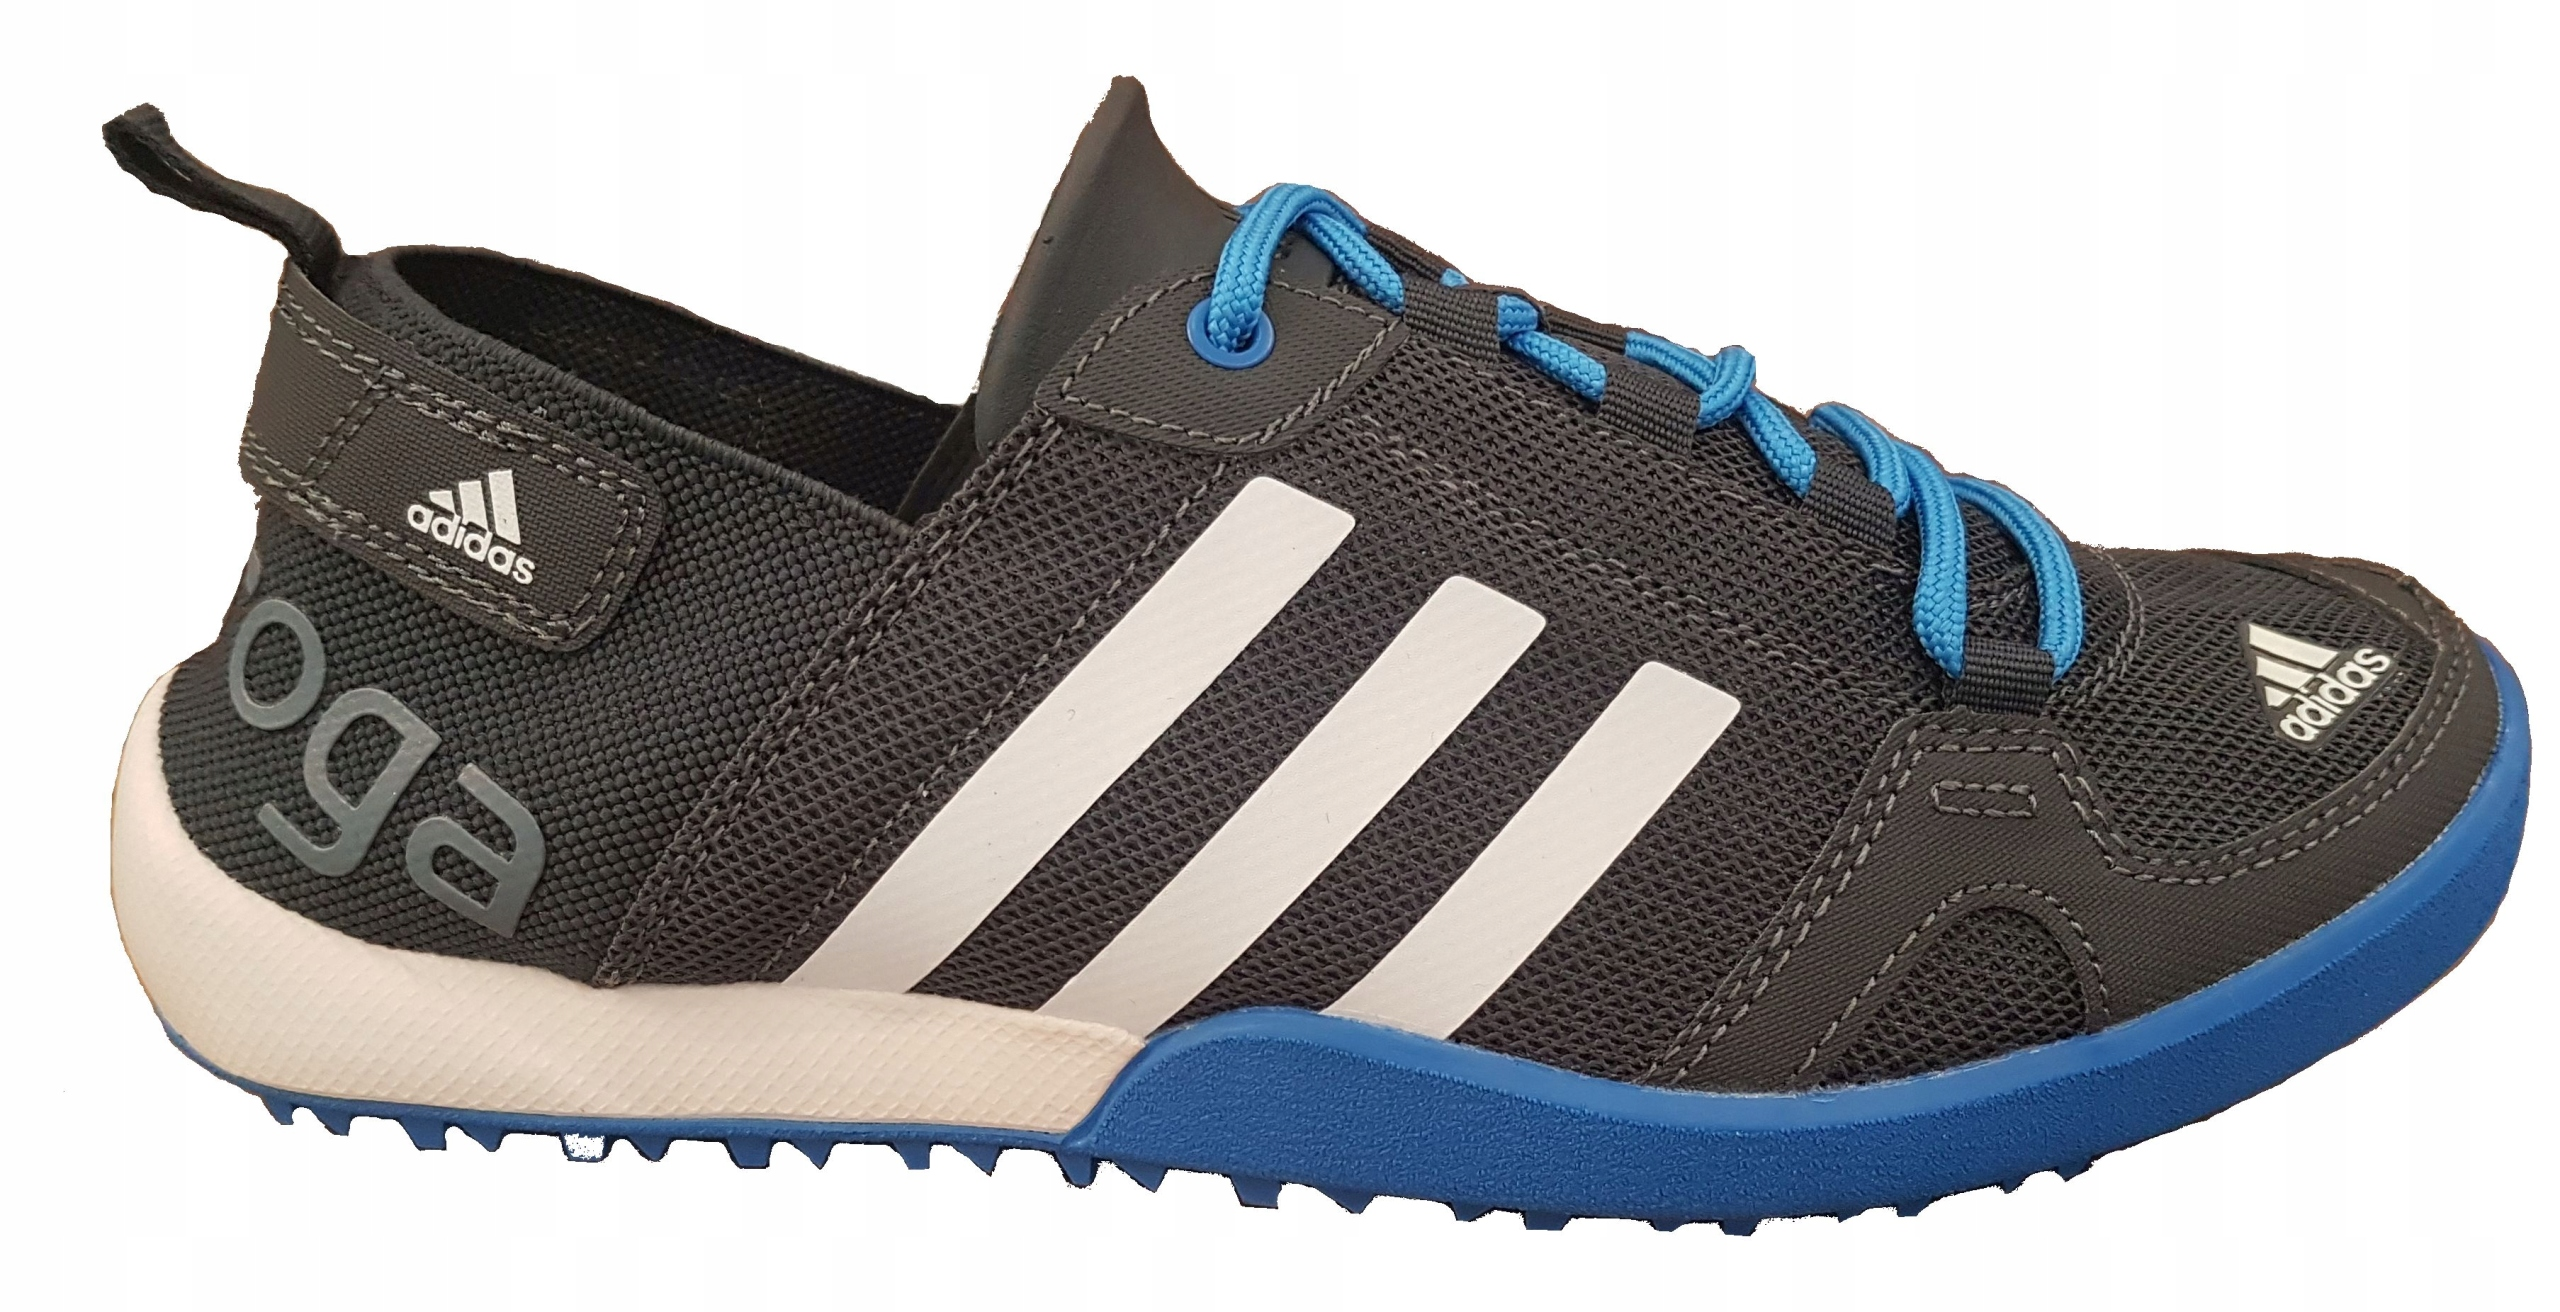 Adidas Daroga Two 13 Climacool S77946 # 42 23